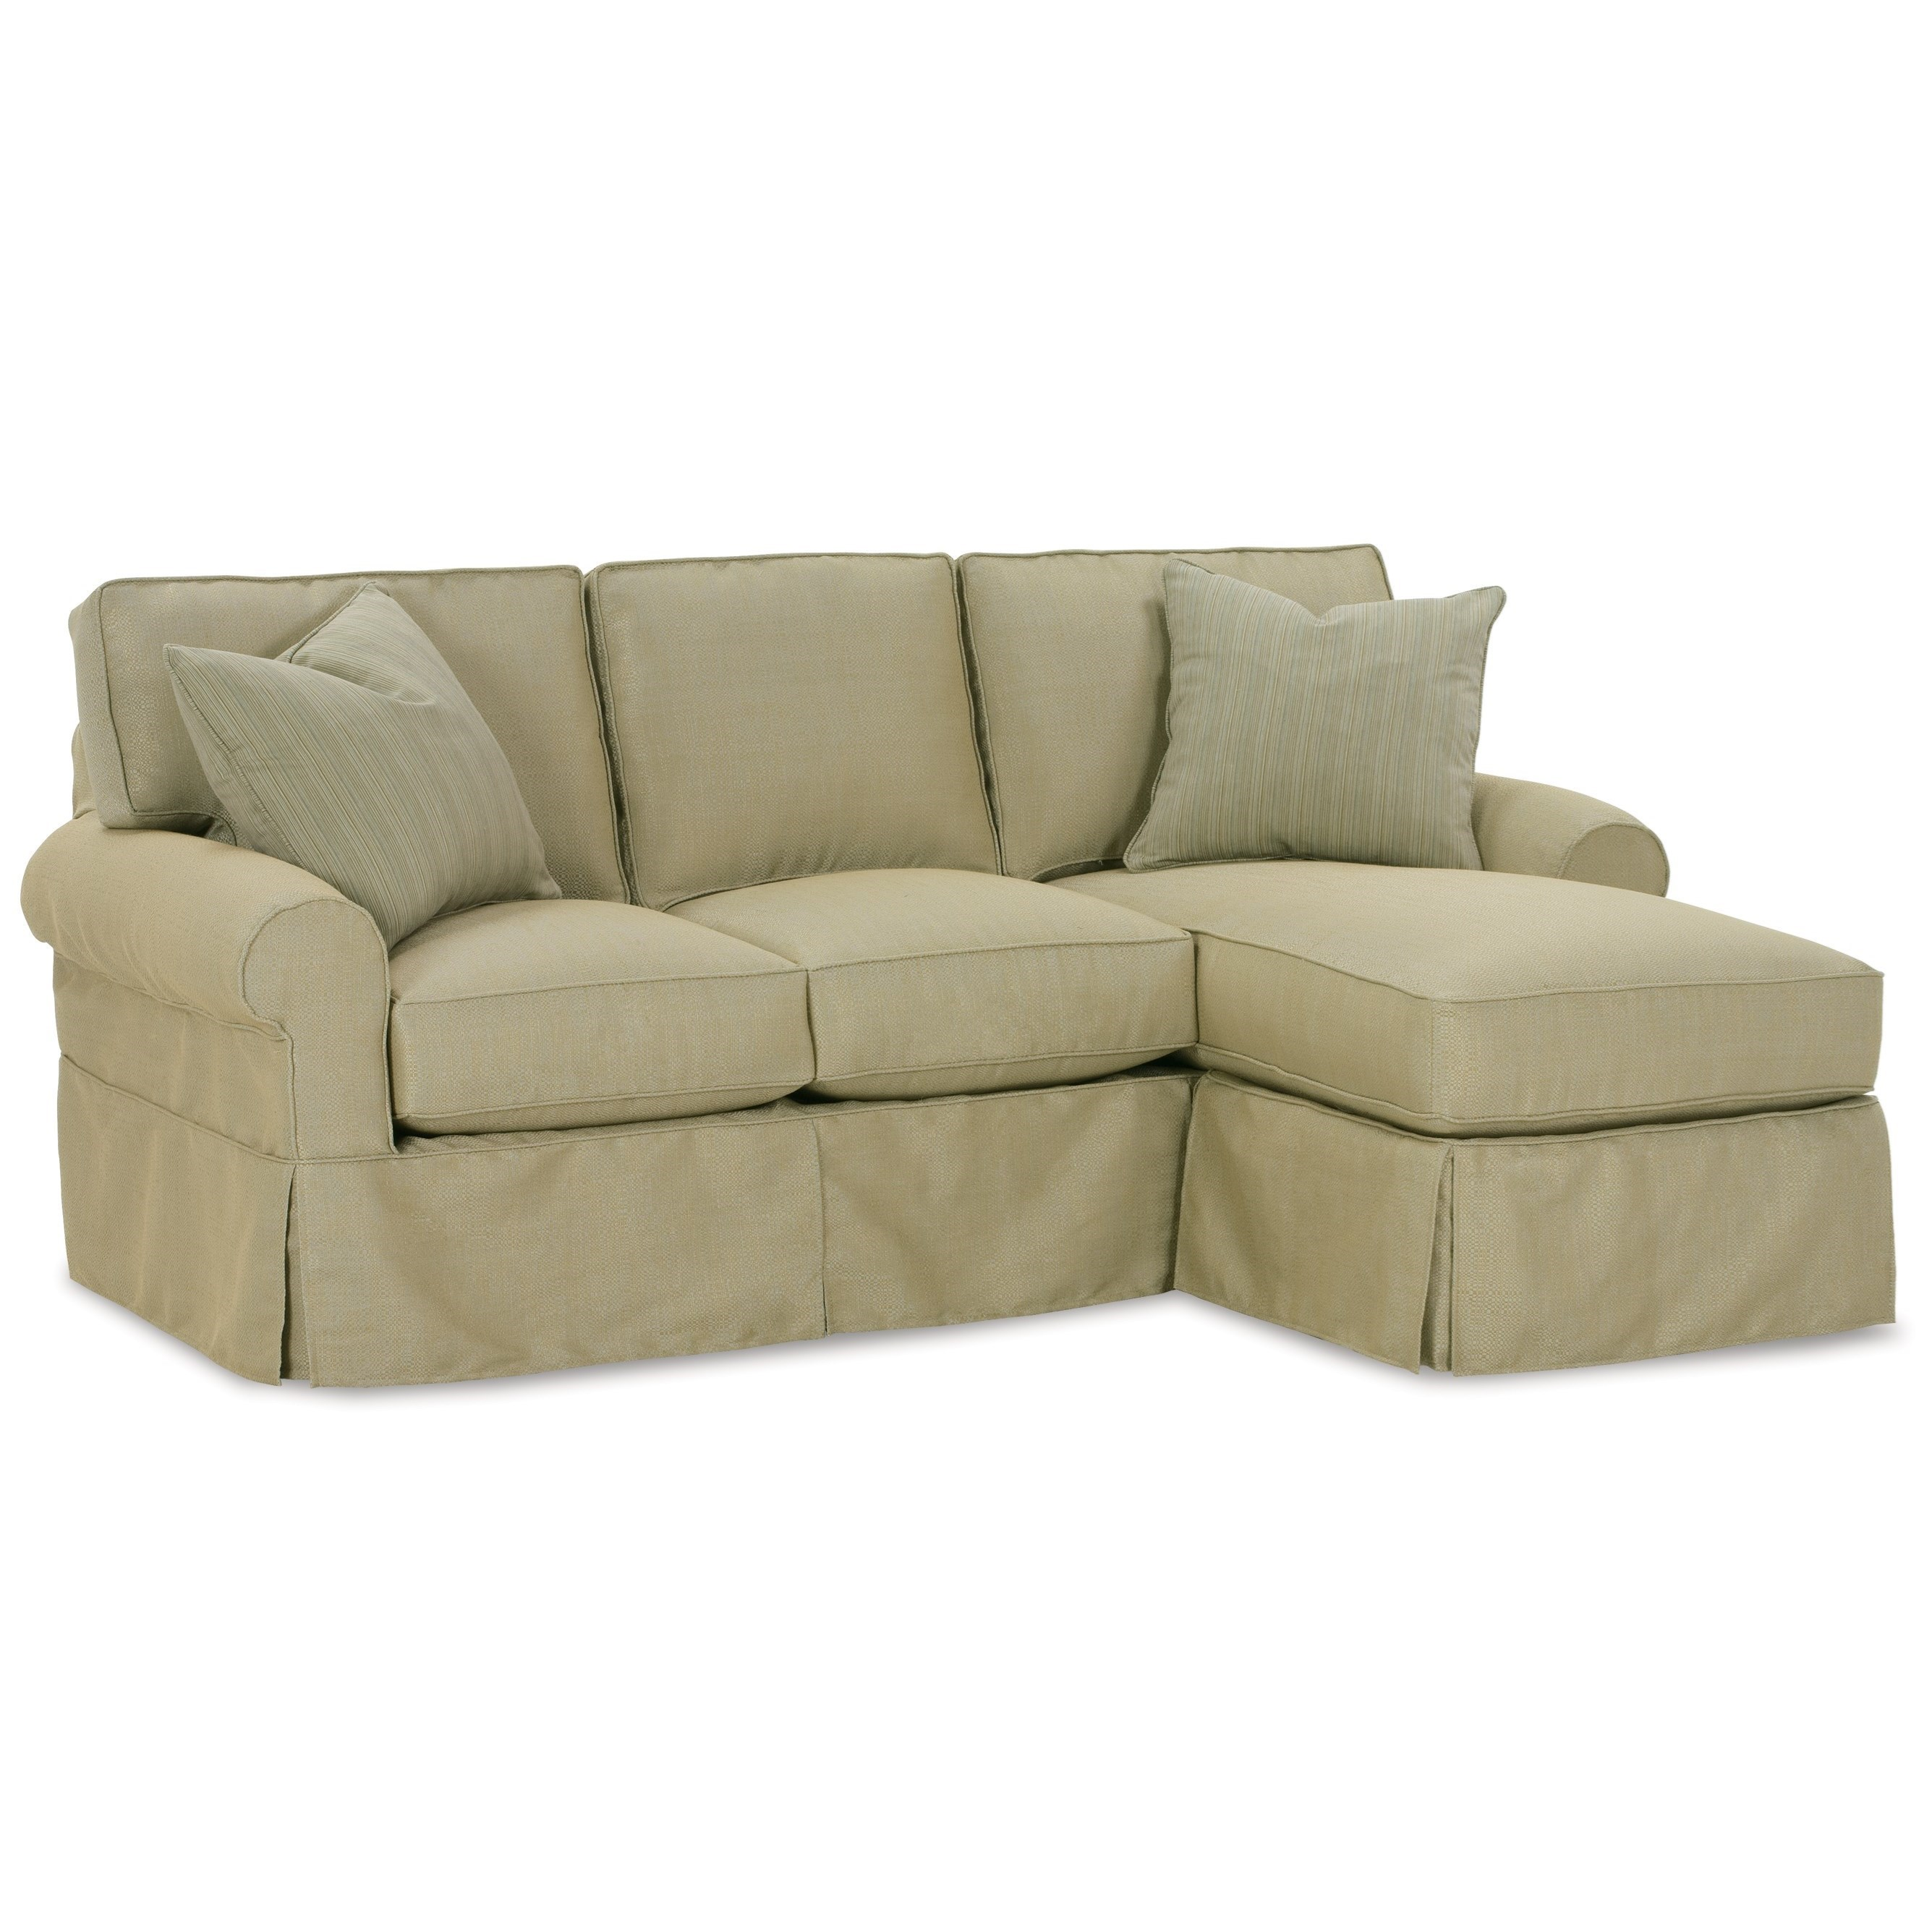 Beau ... Slipcover Sofa Chaise. Rowe Nantucket 84 ...